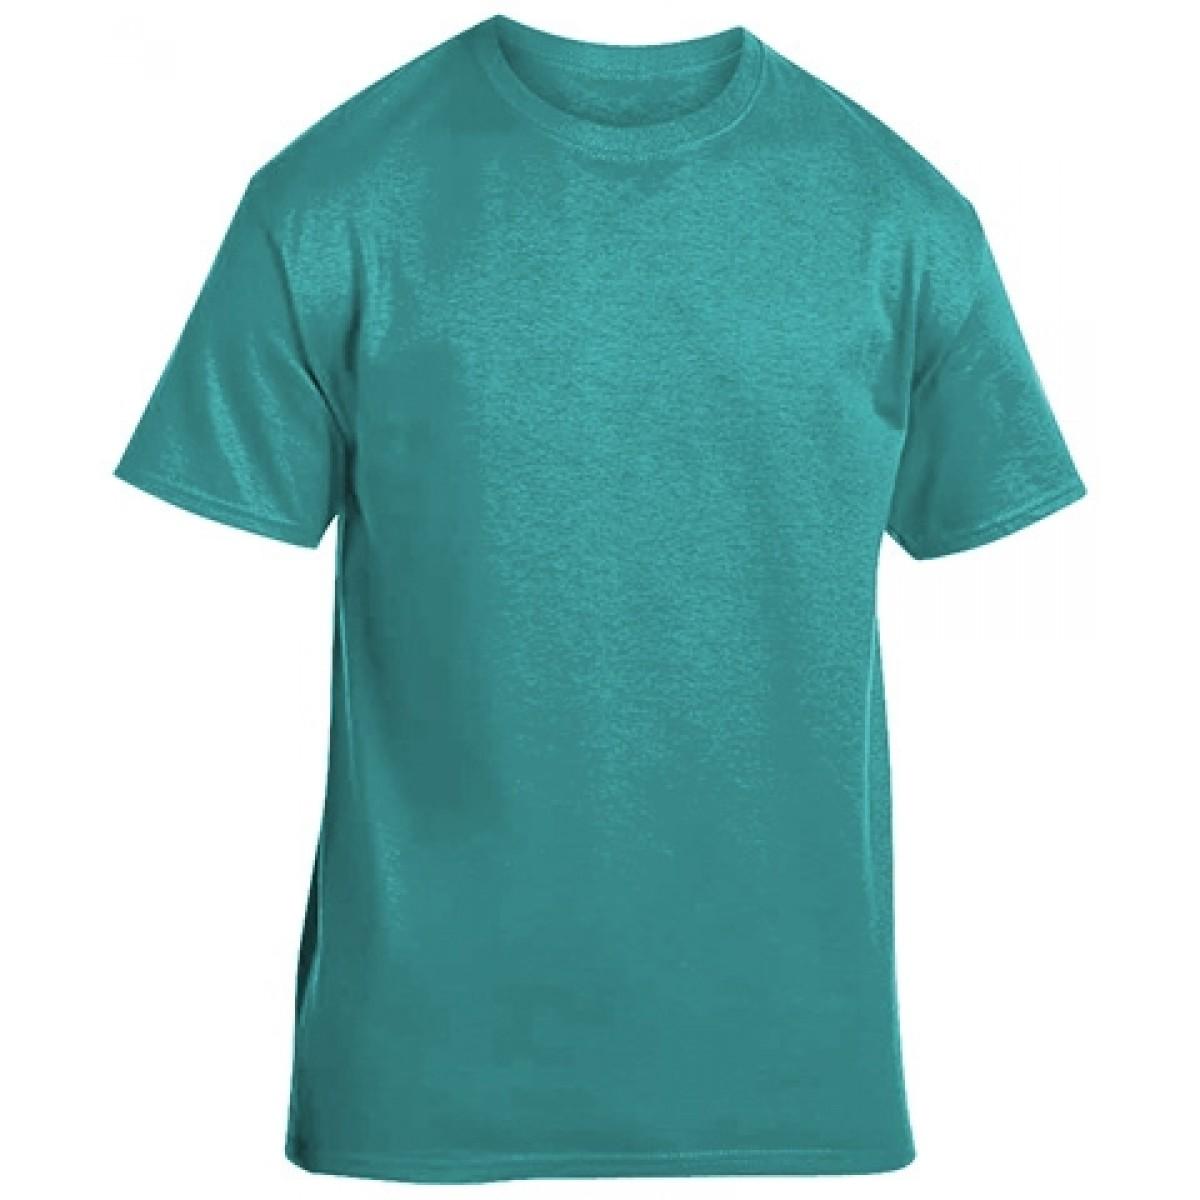 Soft 100% Cotton T-Shirt-Jade-YL